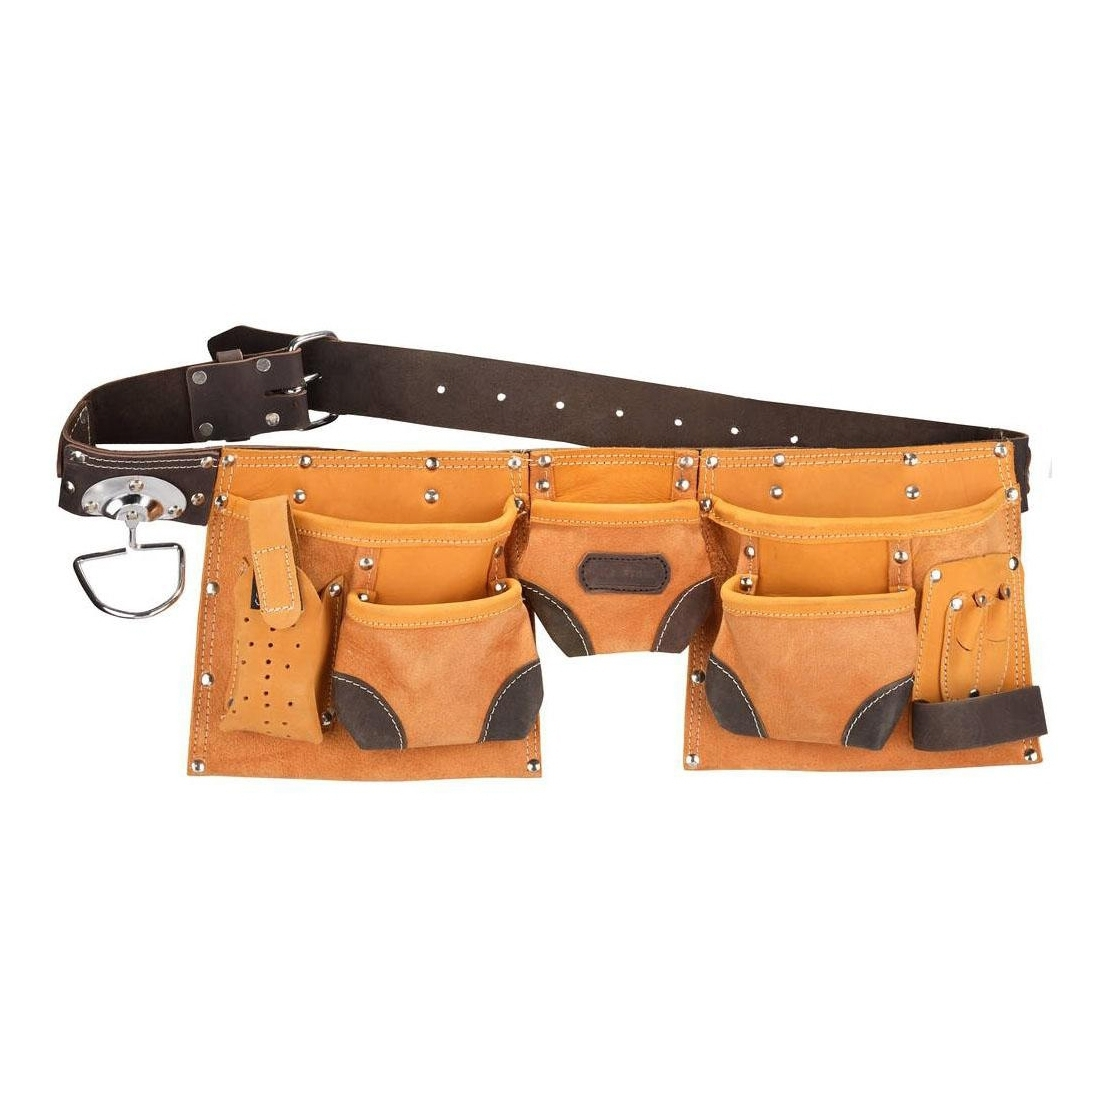 Фото - Bag belt tool KRAFTOOL 1-38520 sy16 black professional waterproof outdoor bag backpack dslr slr camera bag case for nikon canon sony pentax fuji